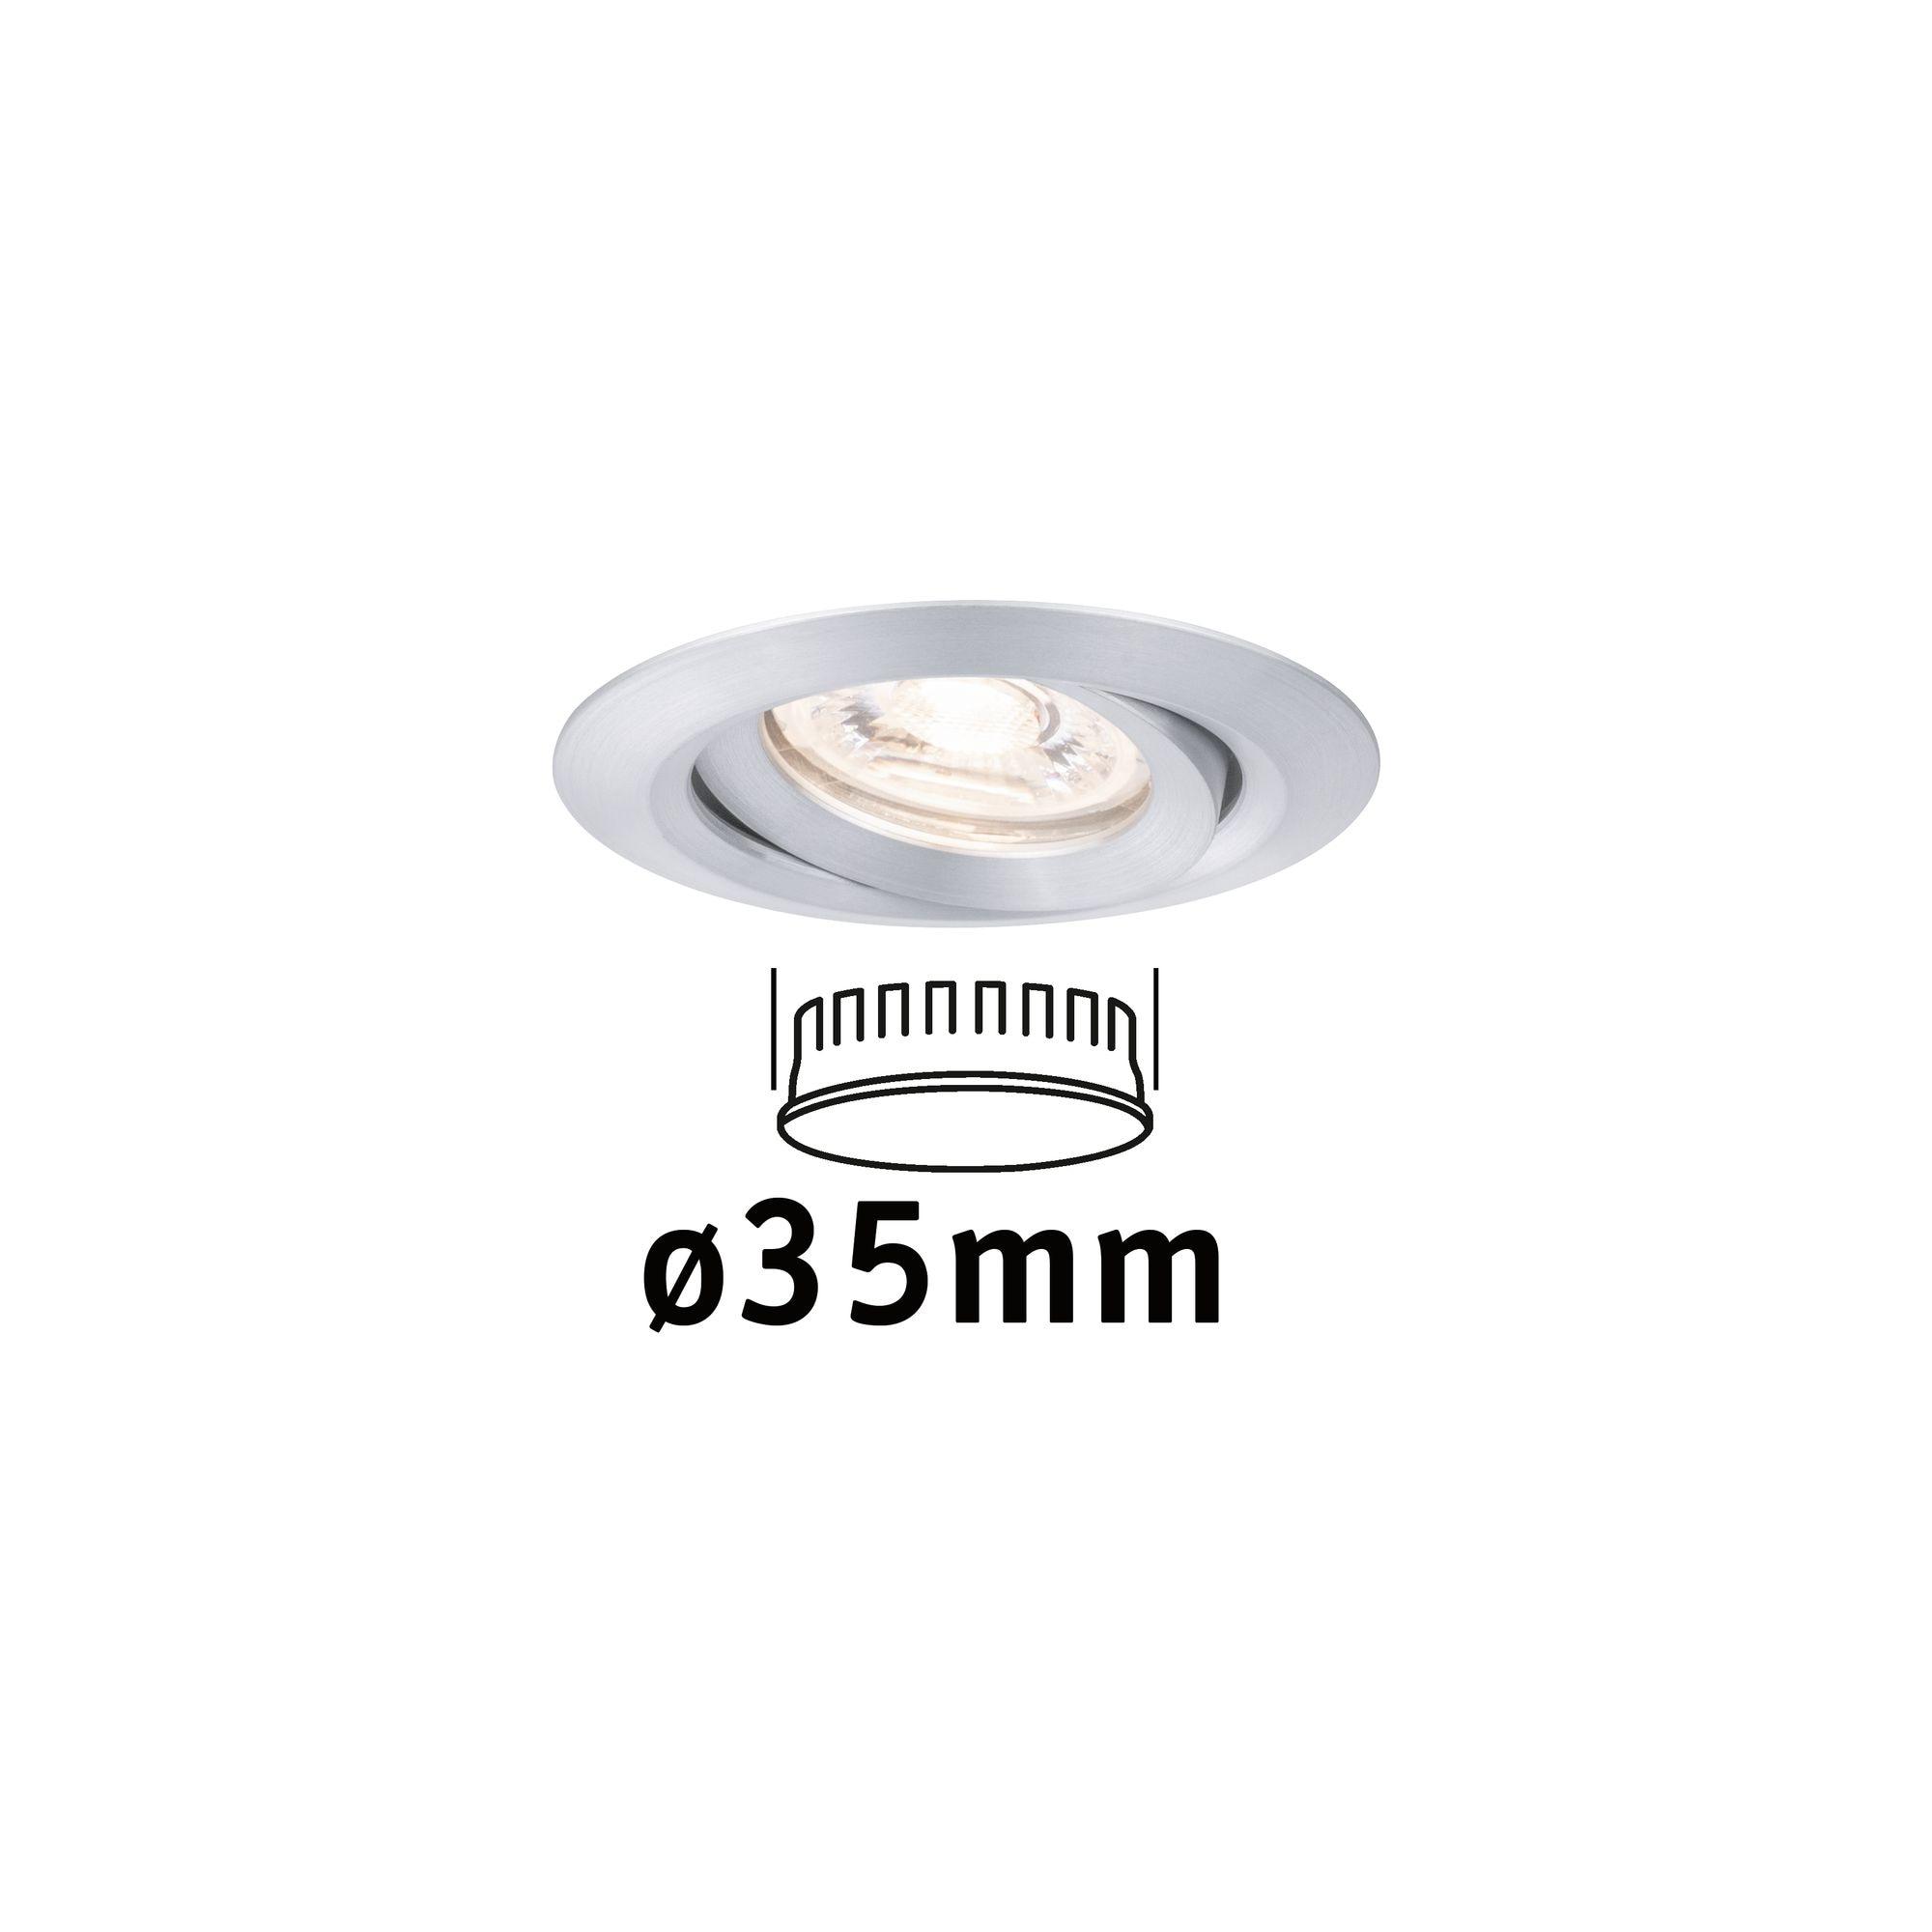 Paulmann LED Einbaustrahler Nova mini schwenkbar 1x4W 2.700K Alu gedreht 230V, 1 St., Warmweiß